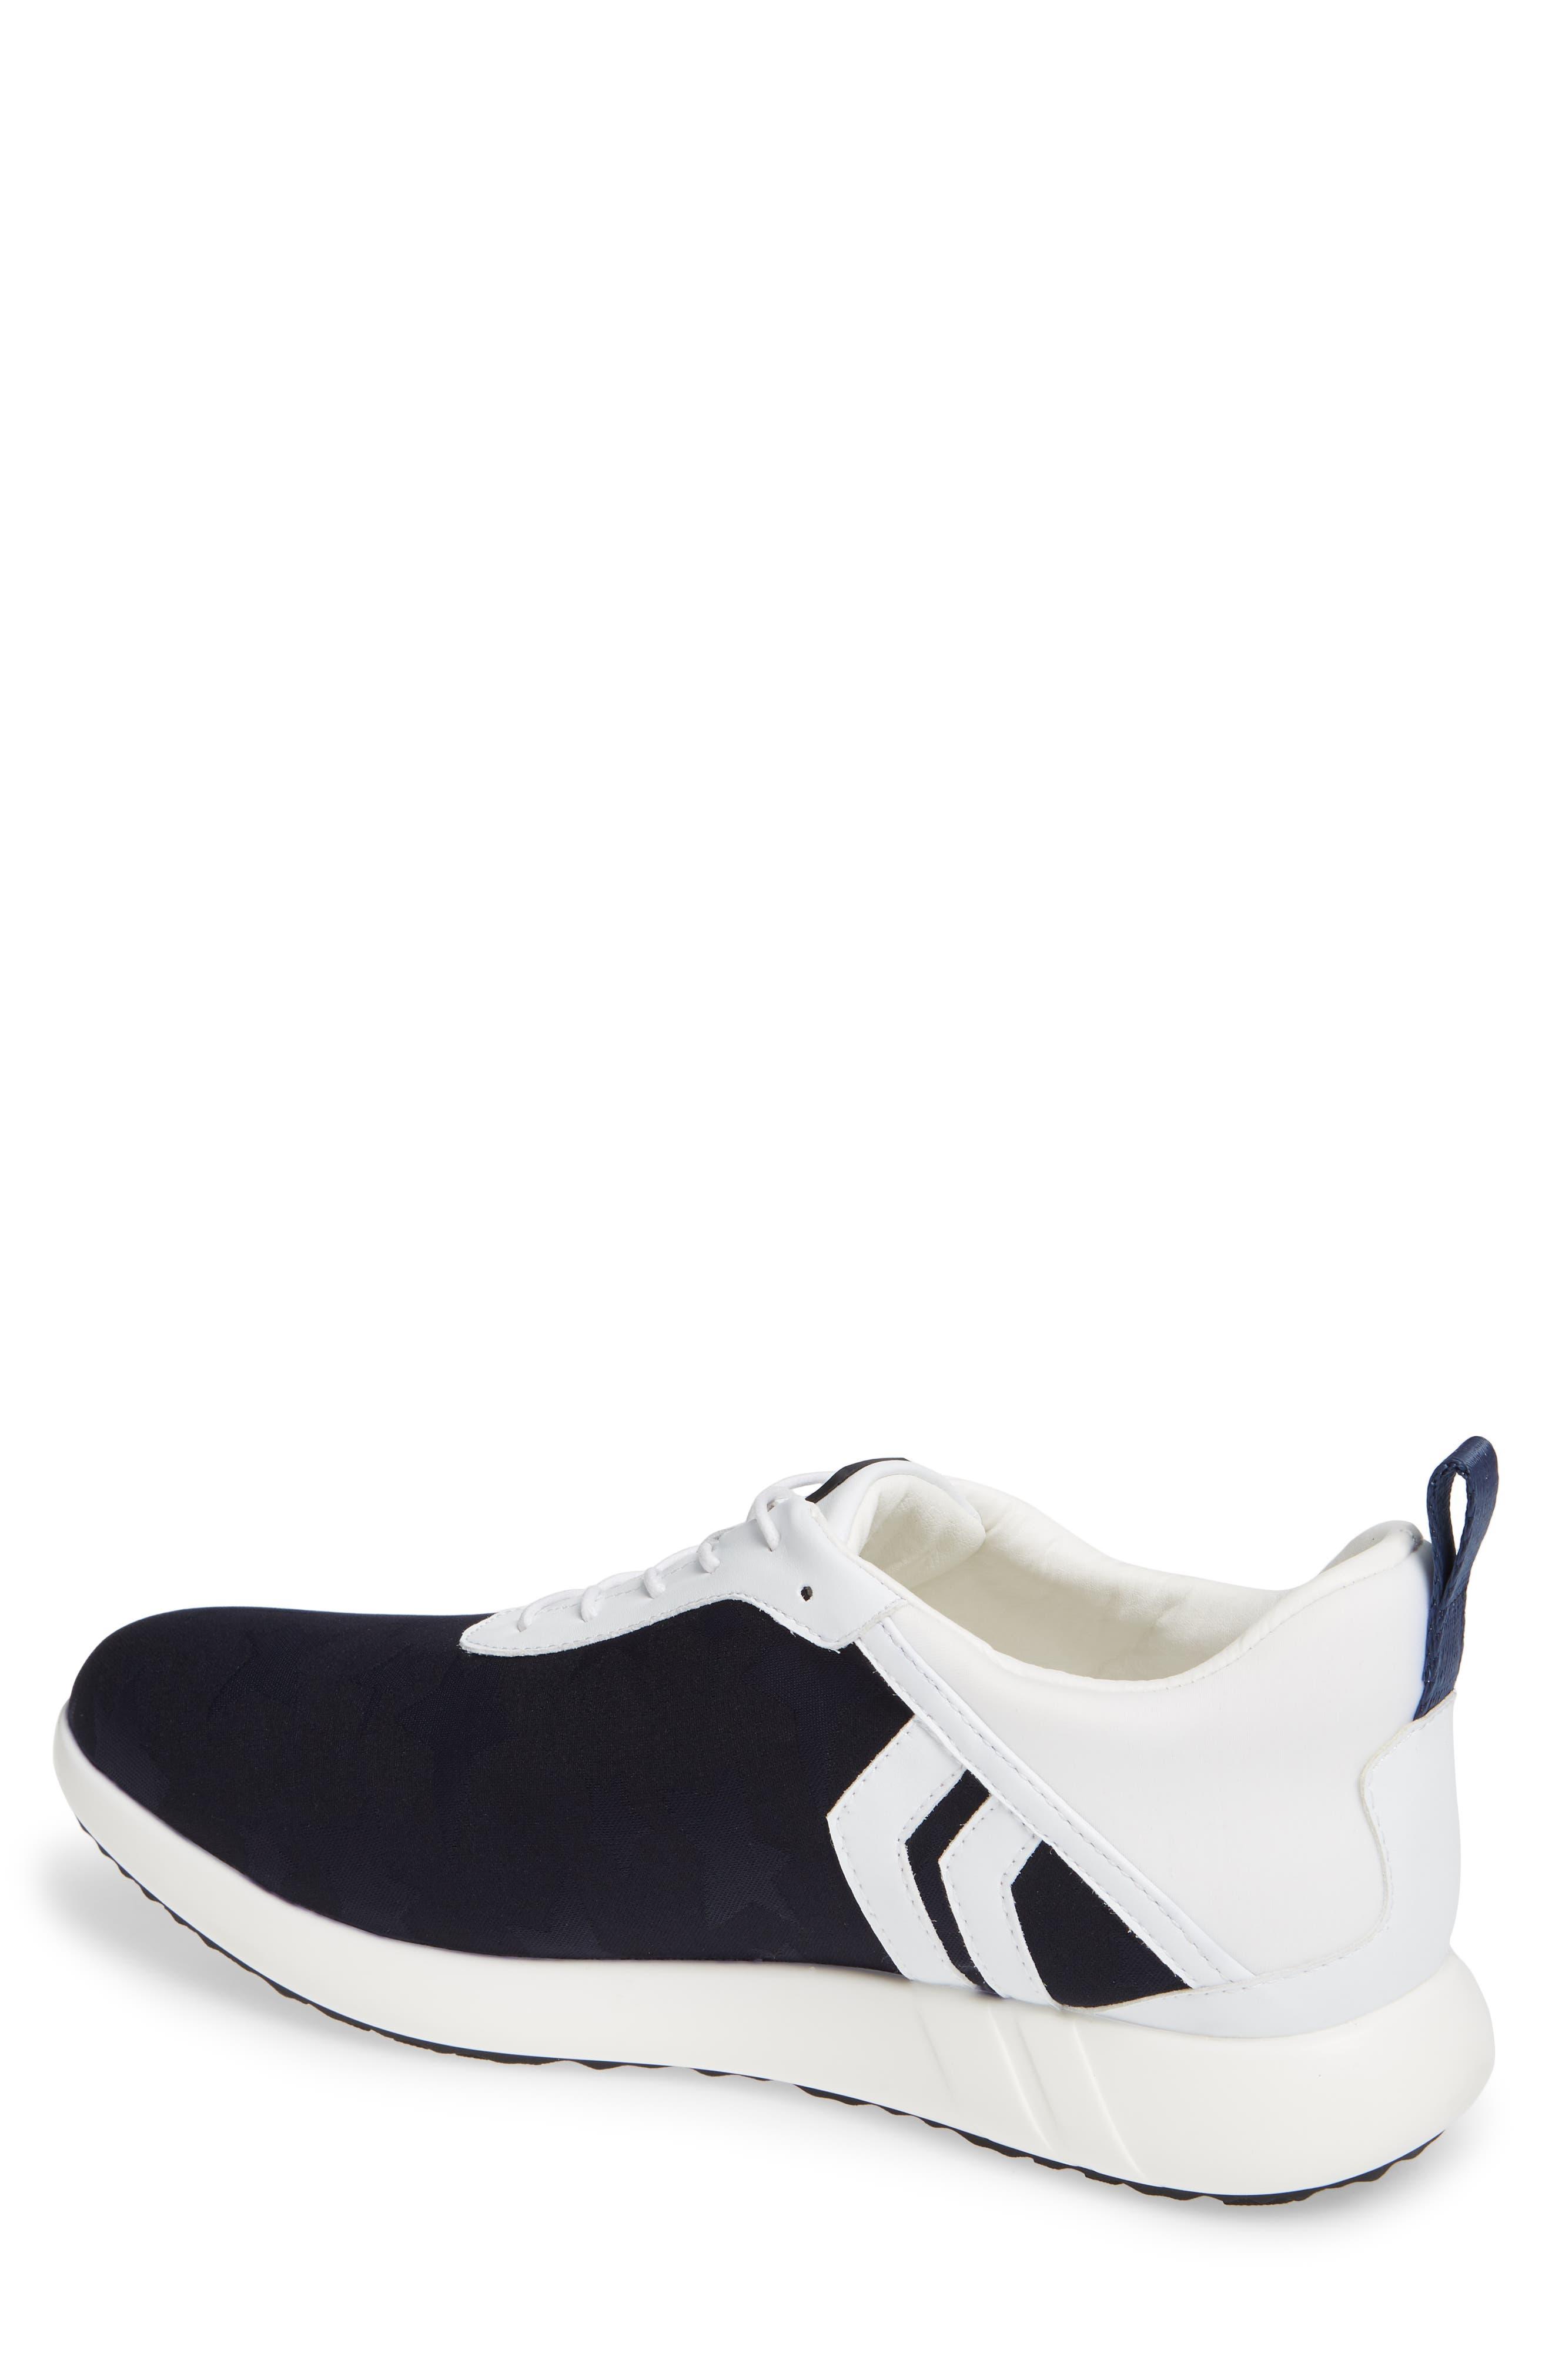 Astro Sneaker,                             Alternate thumbnail 2, color,                             410